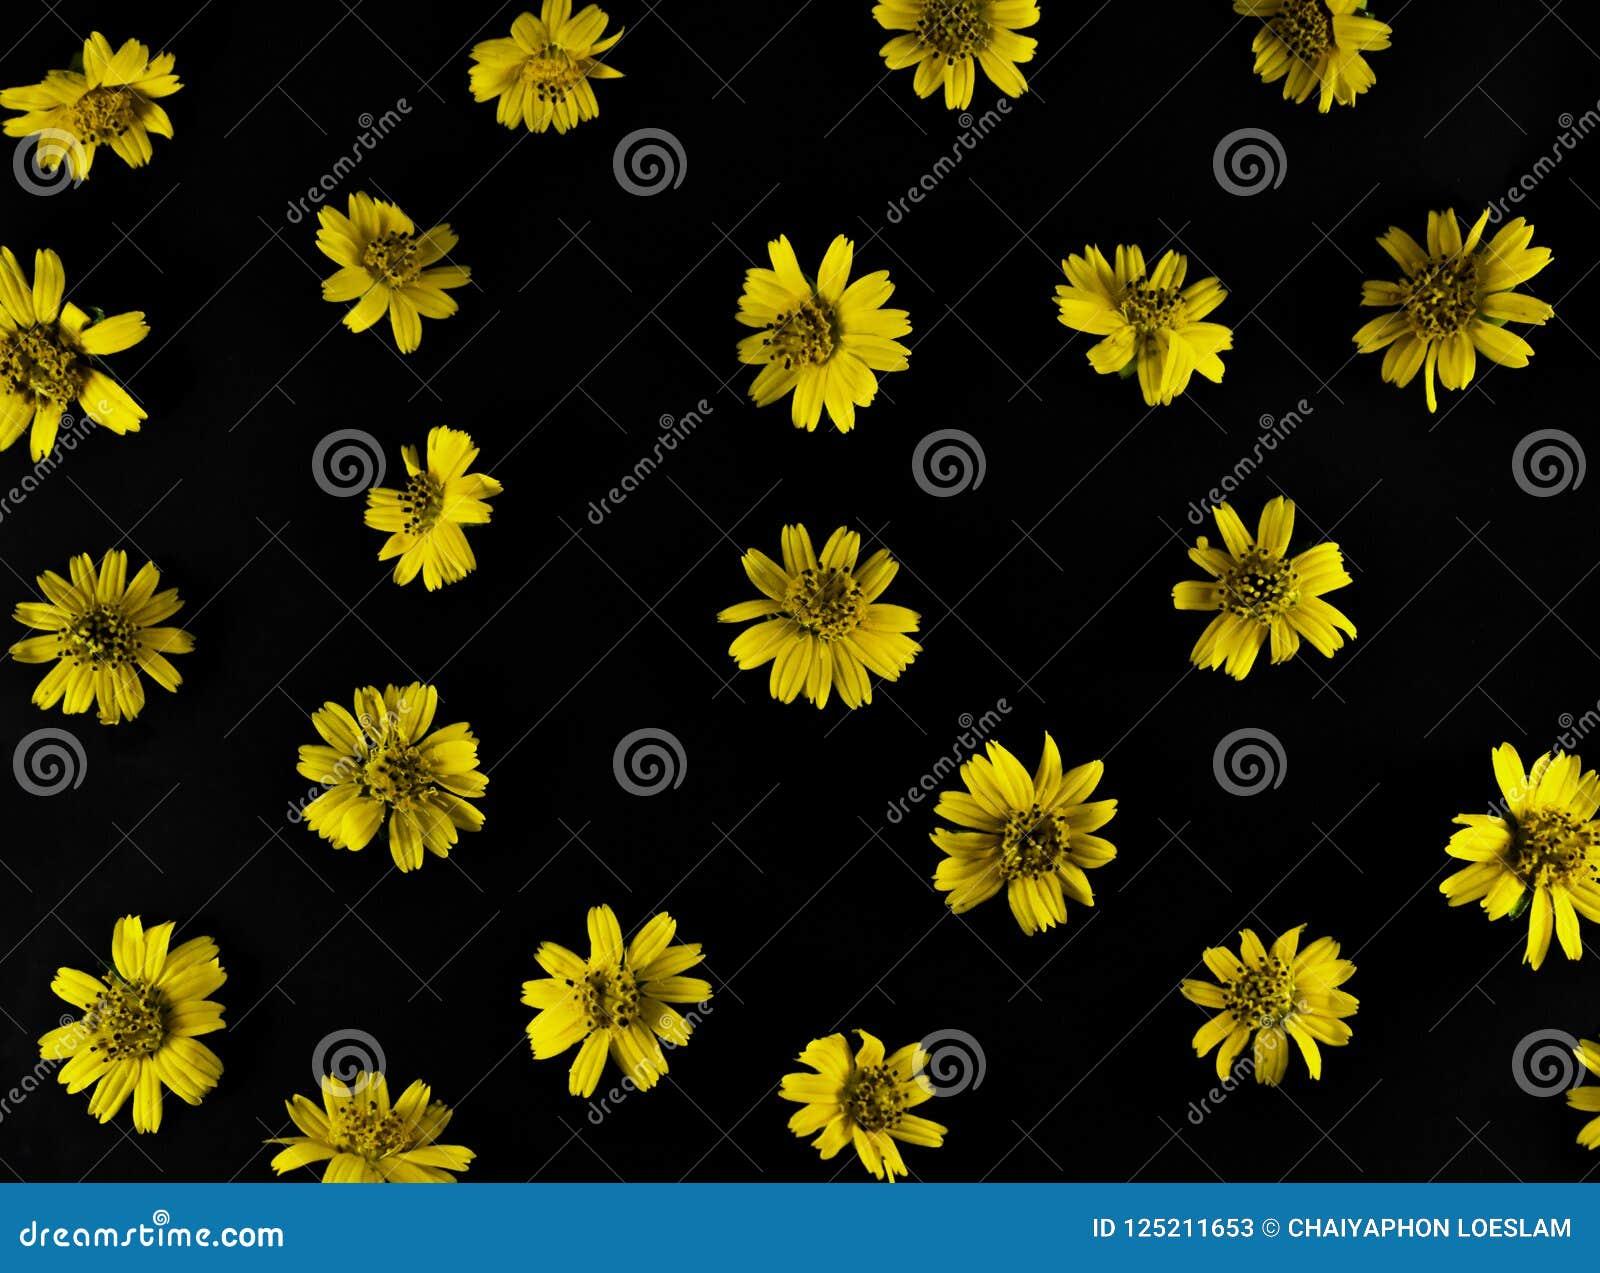 Yellow Flowers On Black Background Stock Image - Image of